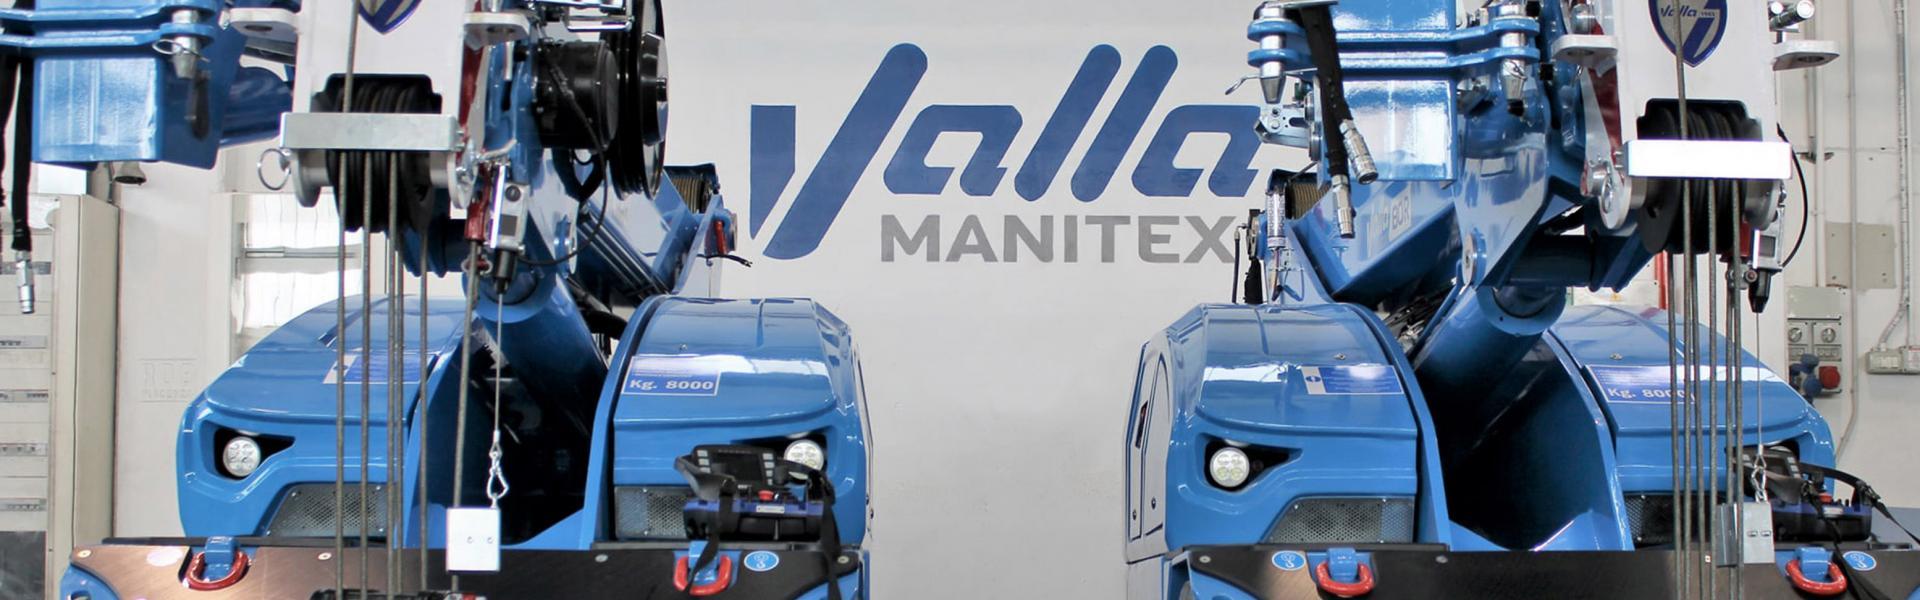 Valla Manitex: sale, rental, assistance and maintenance service